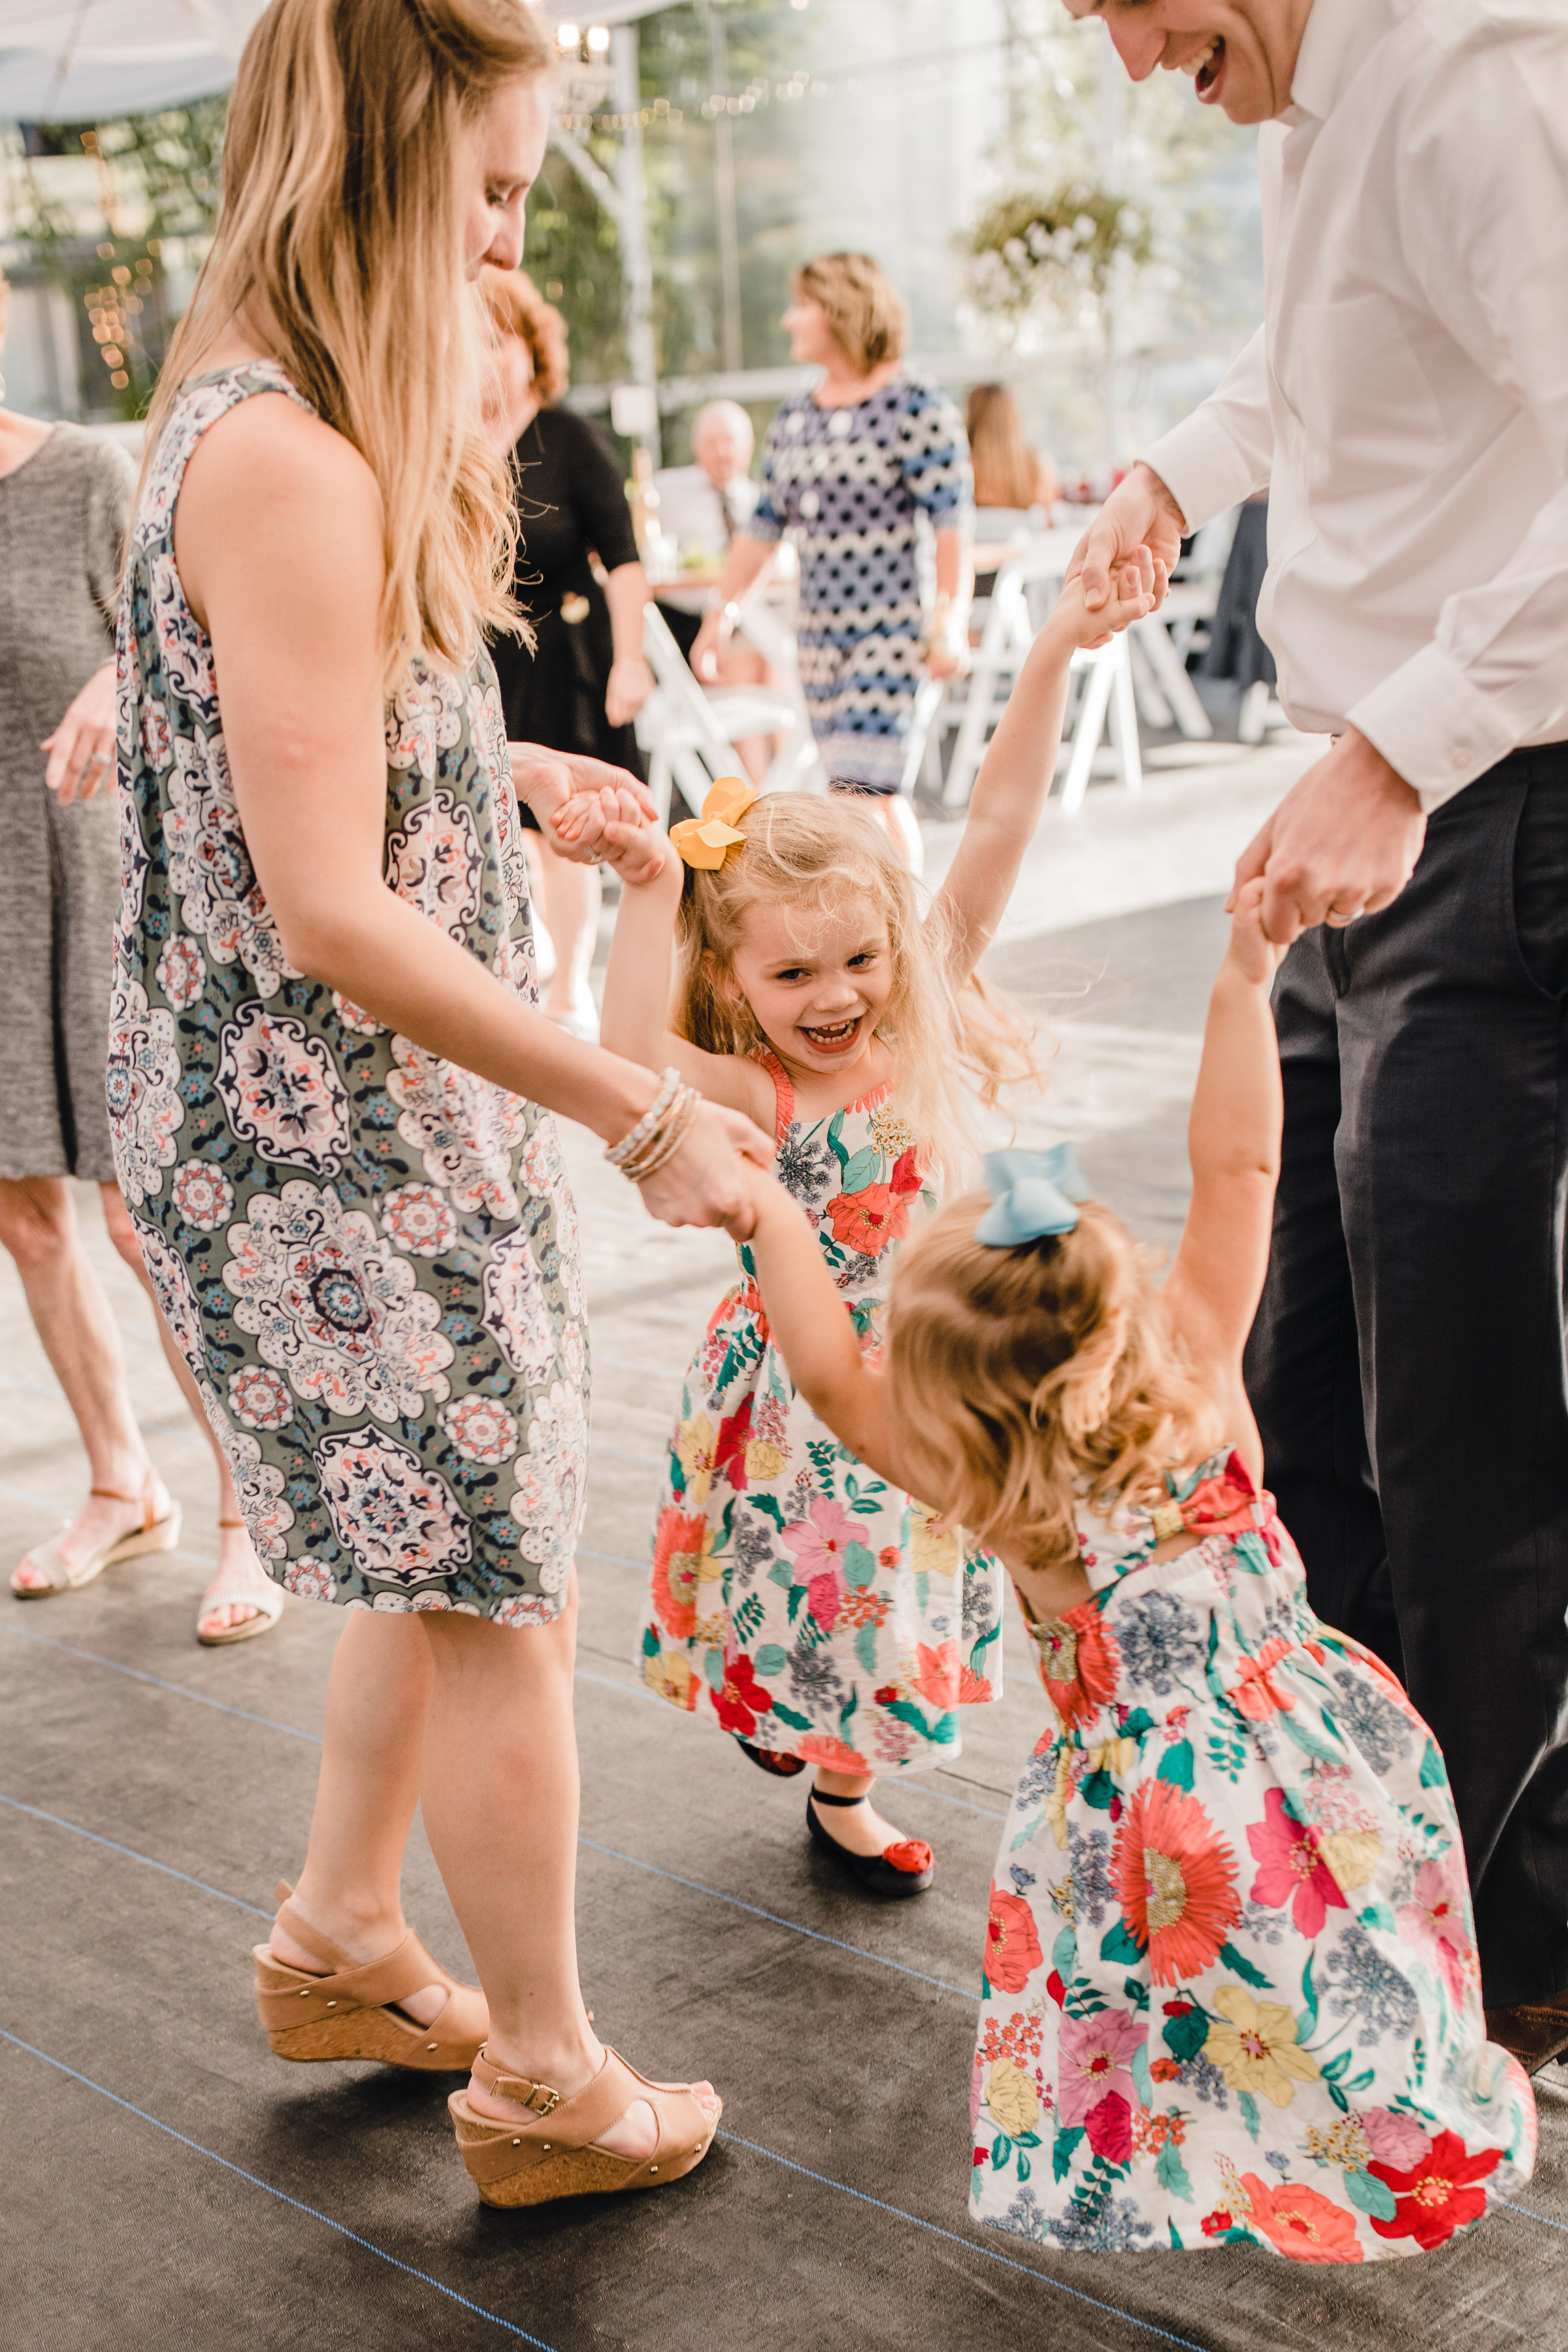 professional wedding photographer olympia washington wedding reception dancing kids holding hands smiling